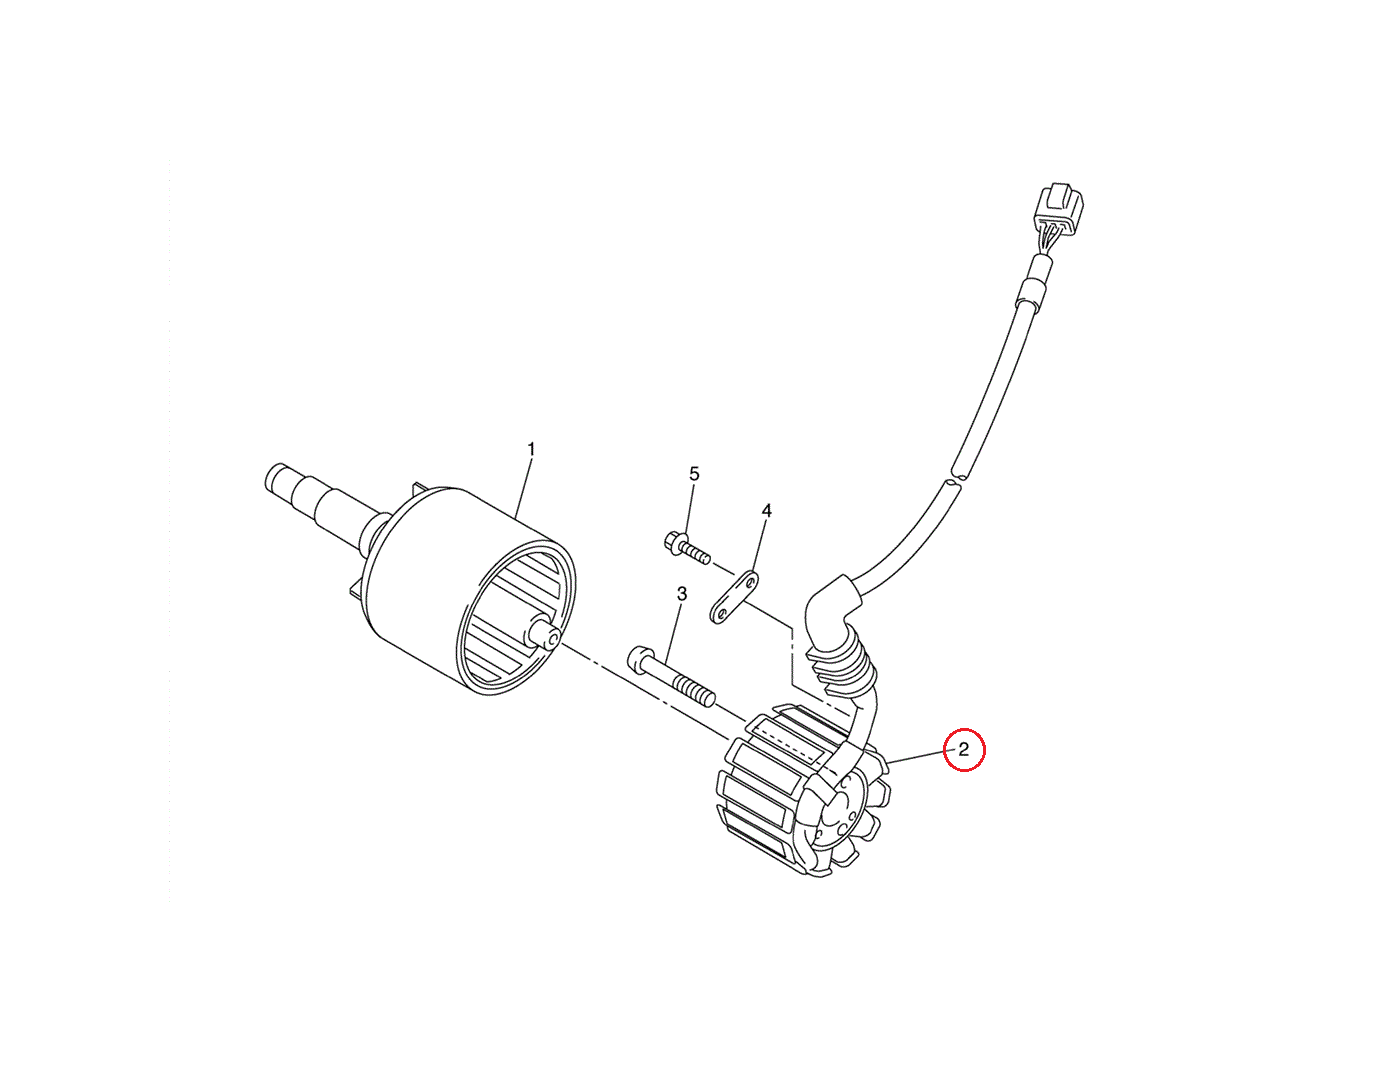 Yamaha YZF-R1 Stator Coil / Magneto / Alternator 2004